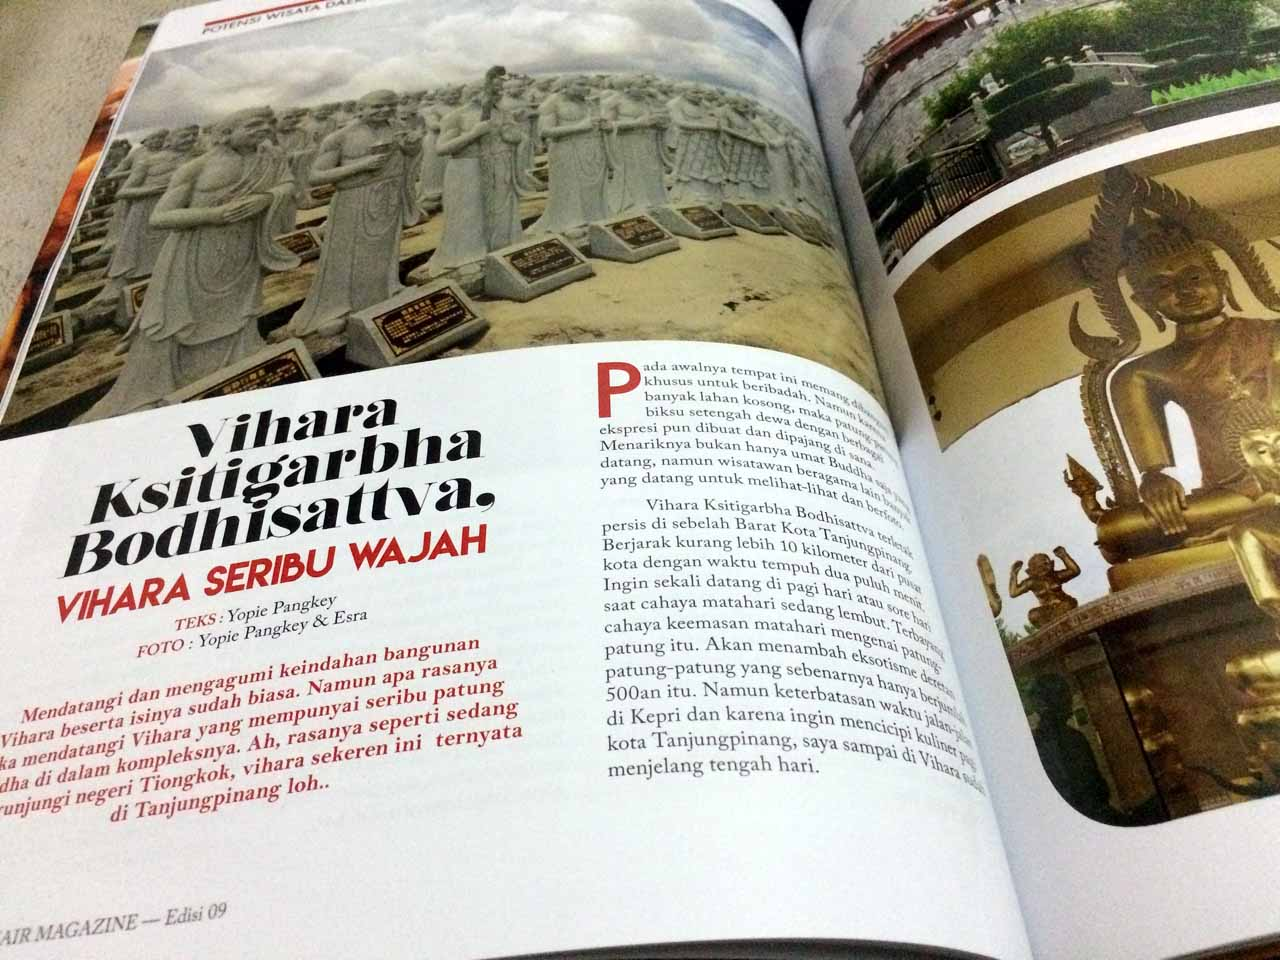 majalah-xpressair-ksitigarbha-bodhisattva-vihara-seribu-wajah-tanjungpinang-kepulauan-riau-yopie-pangkey